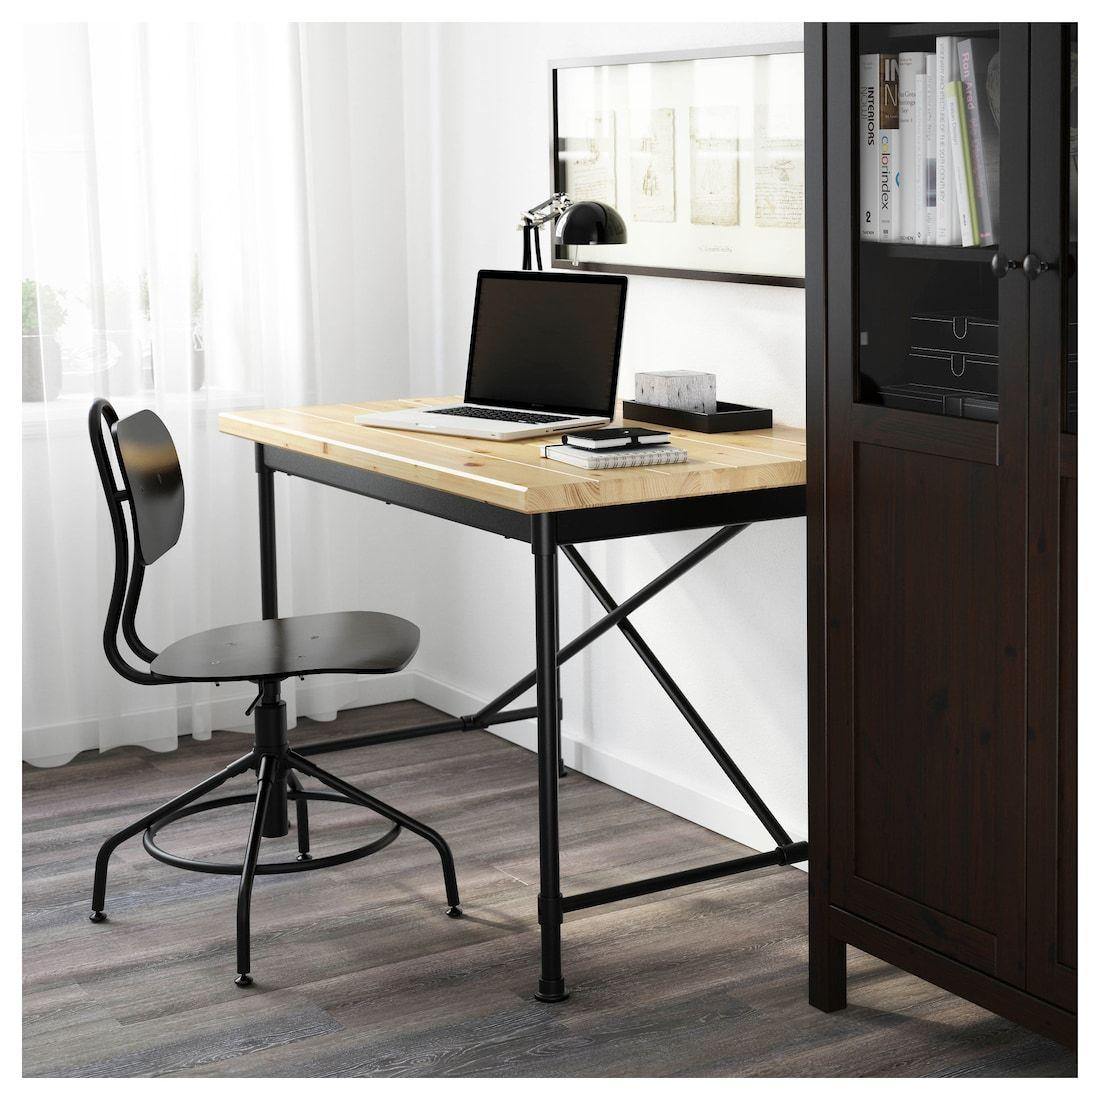 Kullaberg Desk Pine Black 43 1 4x27 1 2 Ikea Home Office Furniture Home Office Design Ikea Desk